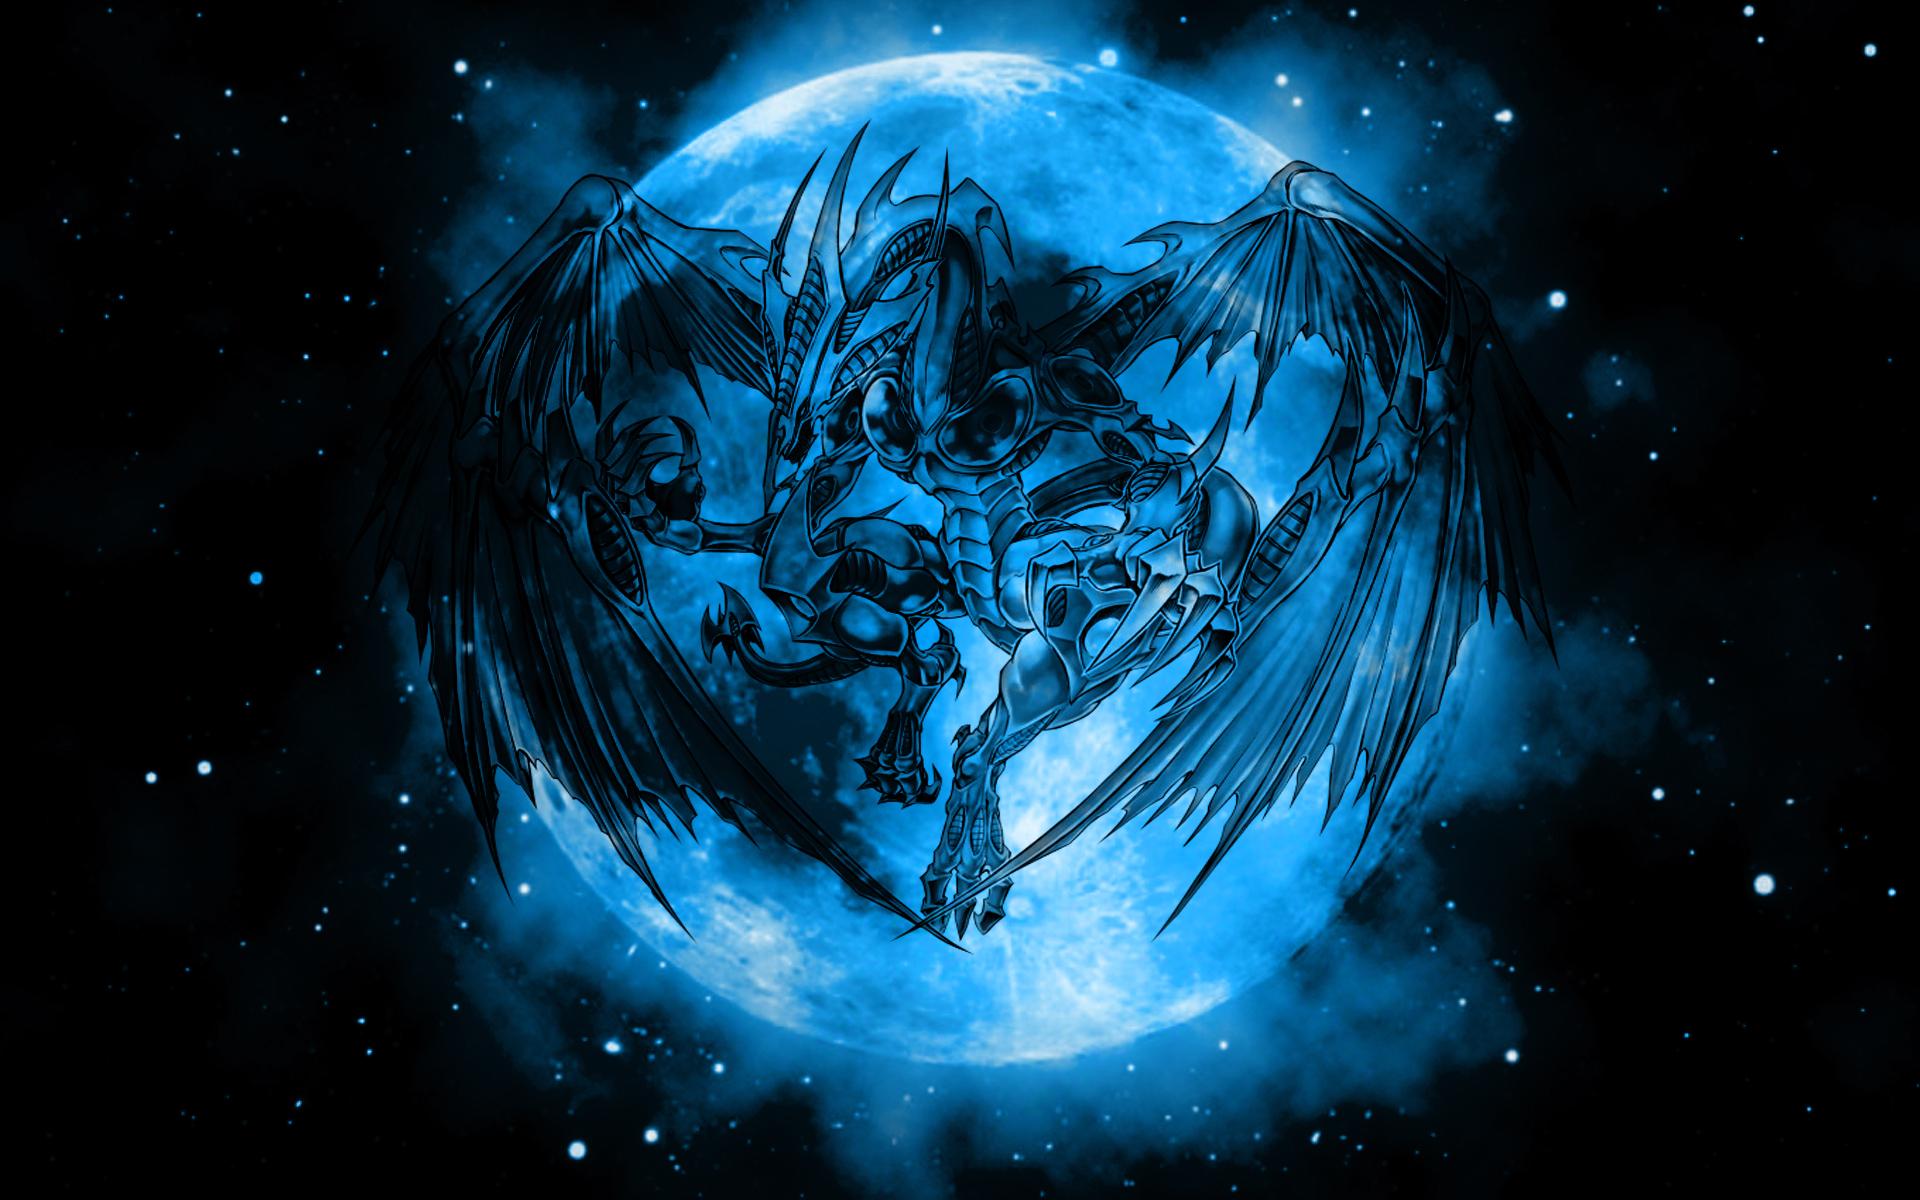 http://fc02.deviantart.net/fs70/f/2010/318/7/d/stardust_dragon_hd_by_alexeiyuri-d32tdqr.jpg